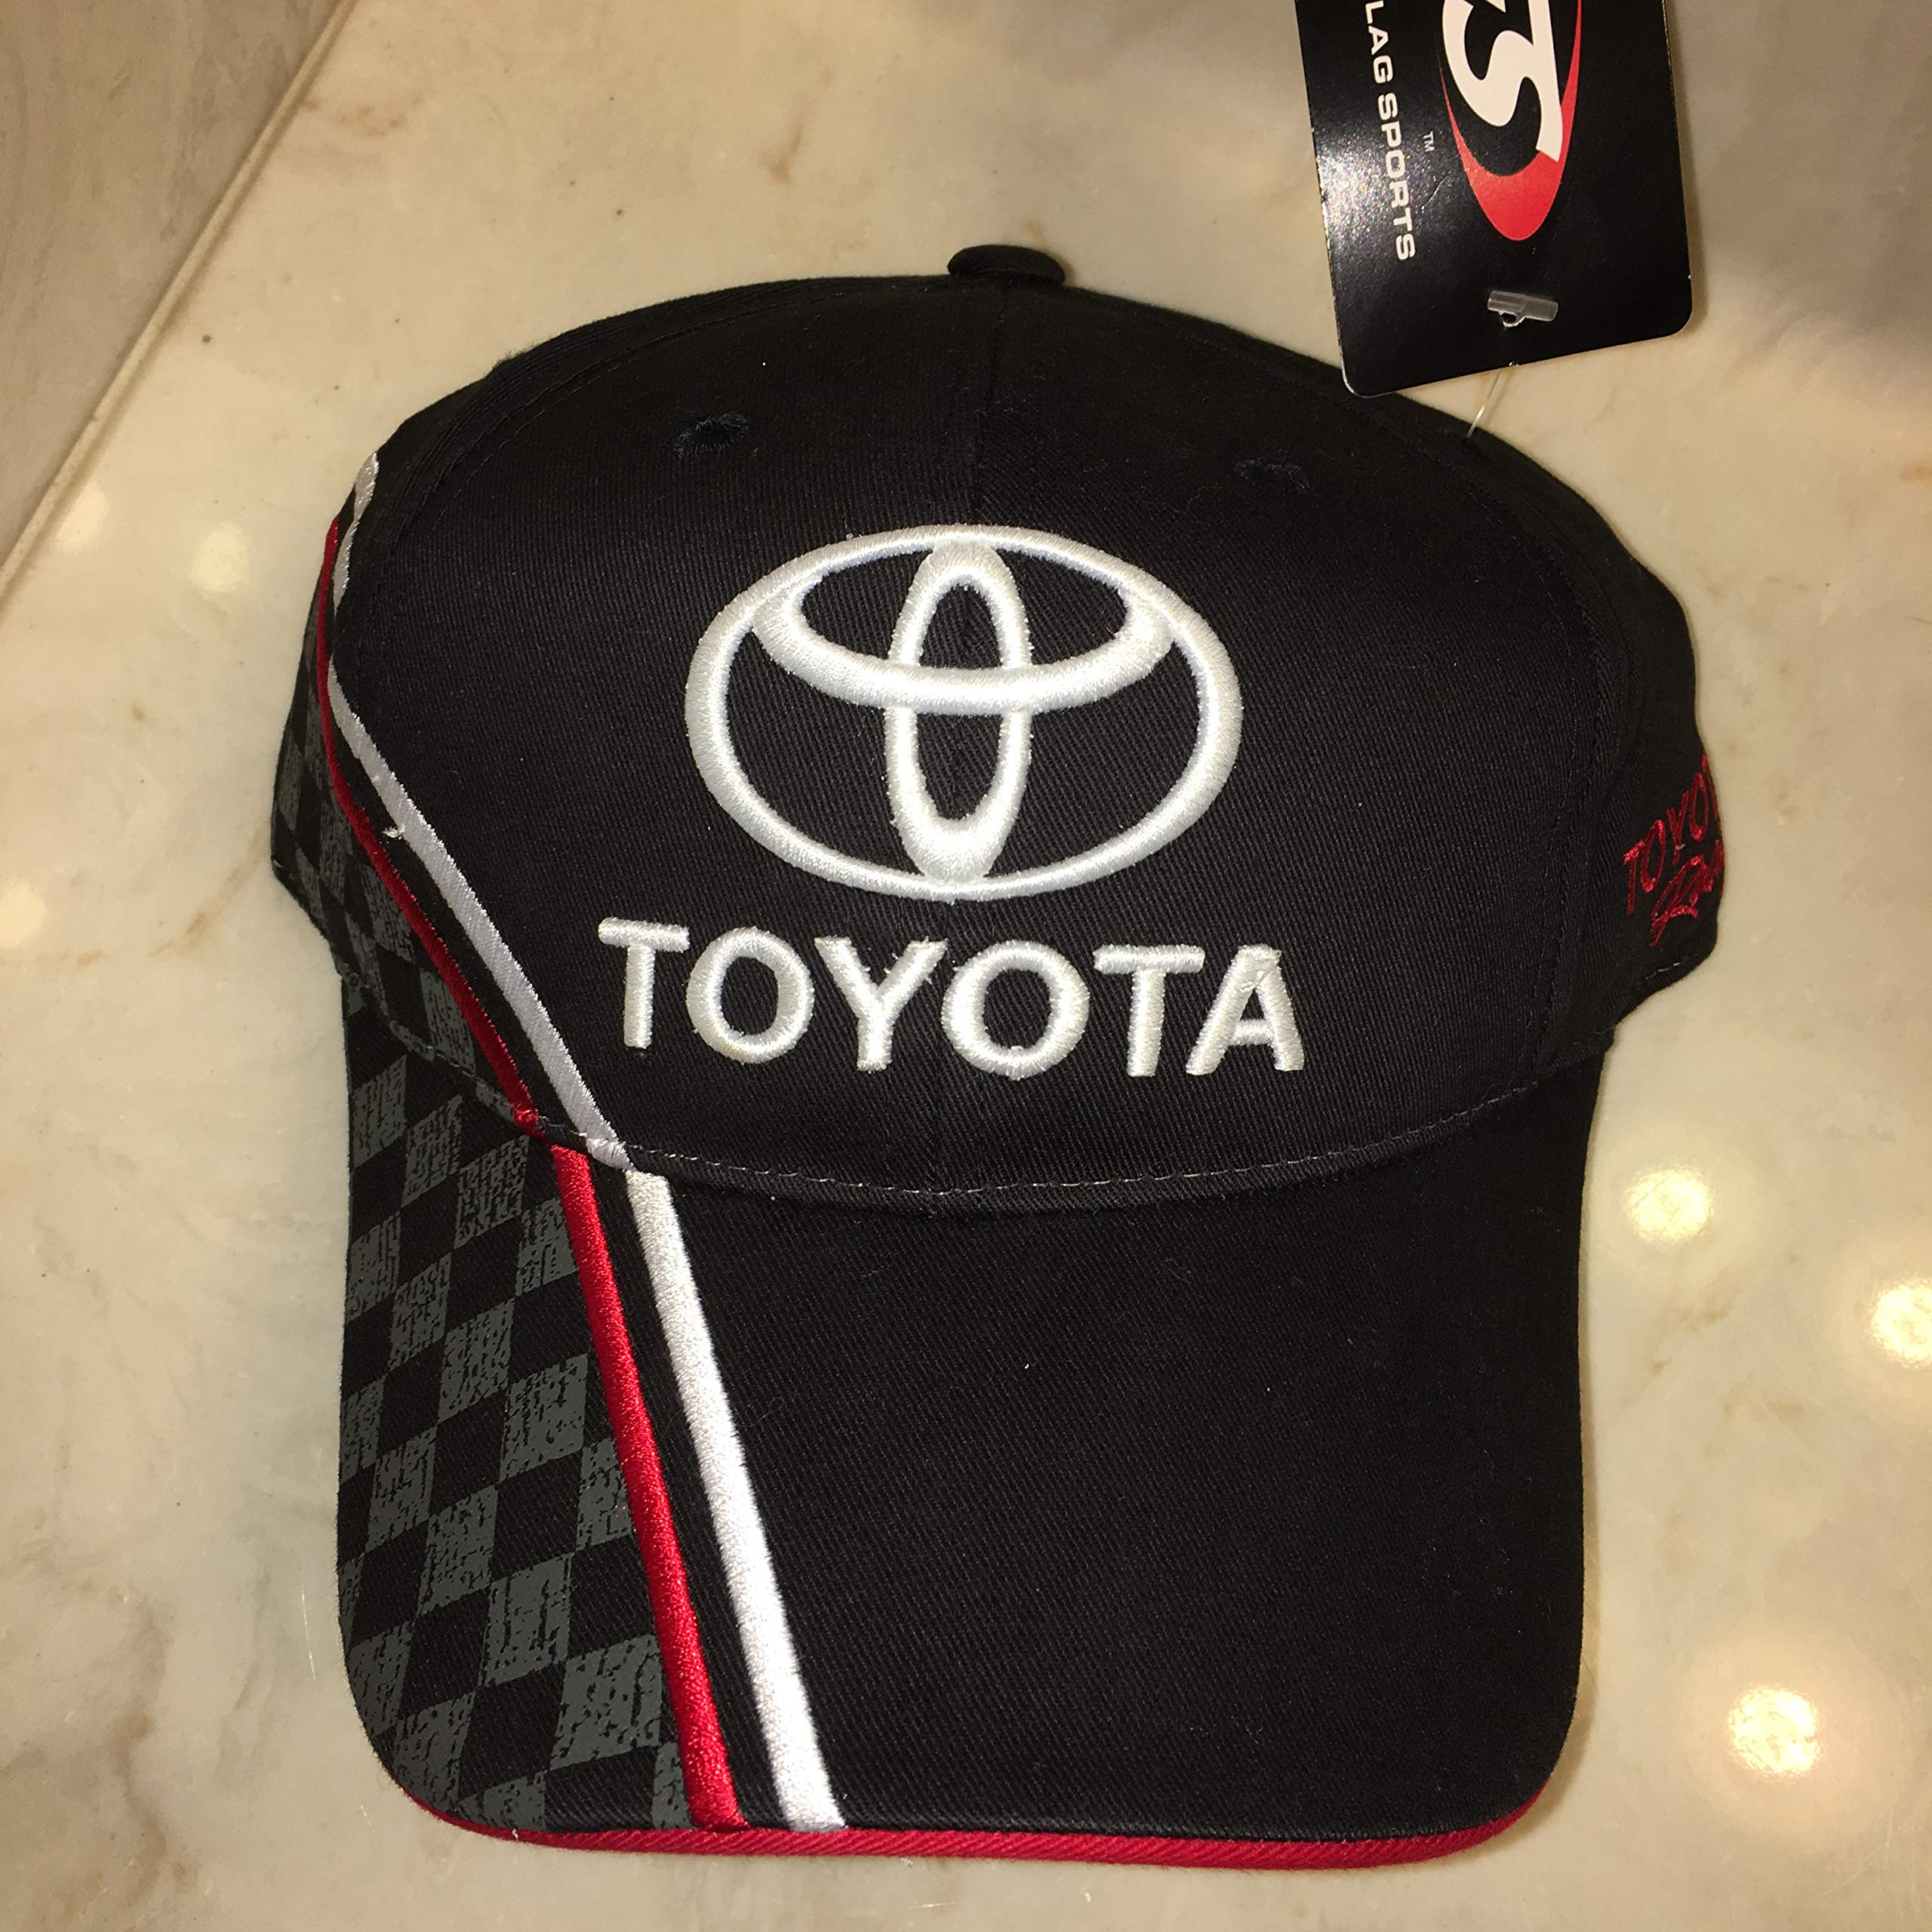 2010 NASCAR TOYOTA RACING VICTORY LANE HAT CAP SEWN